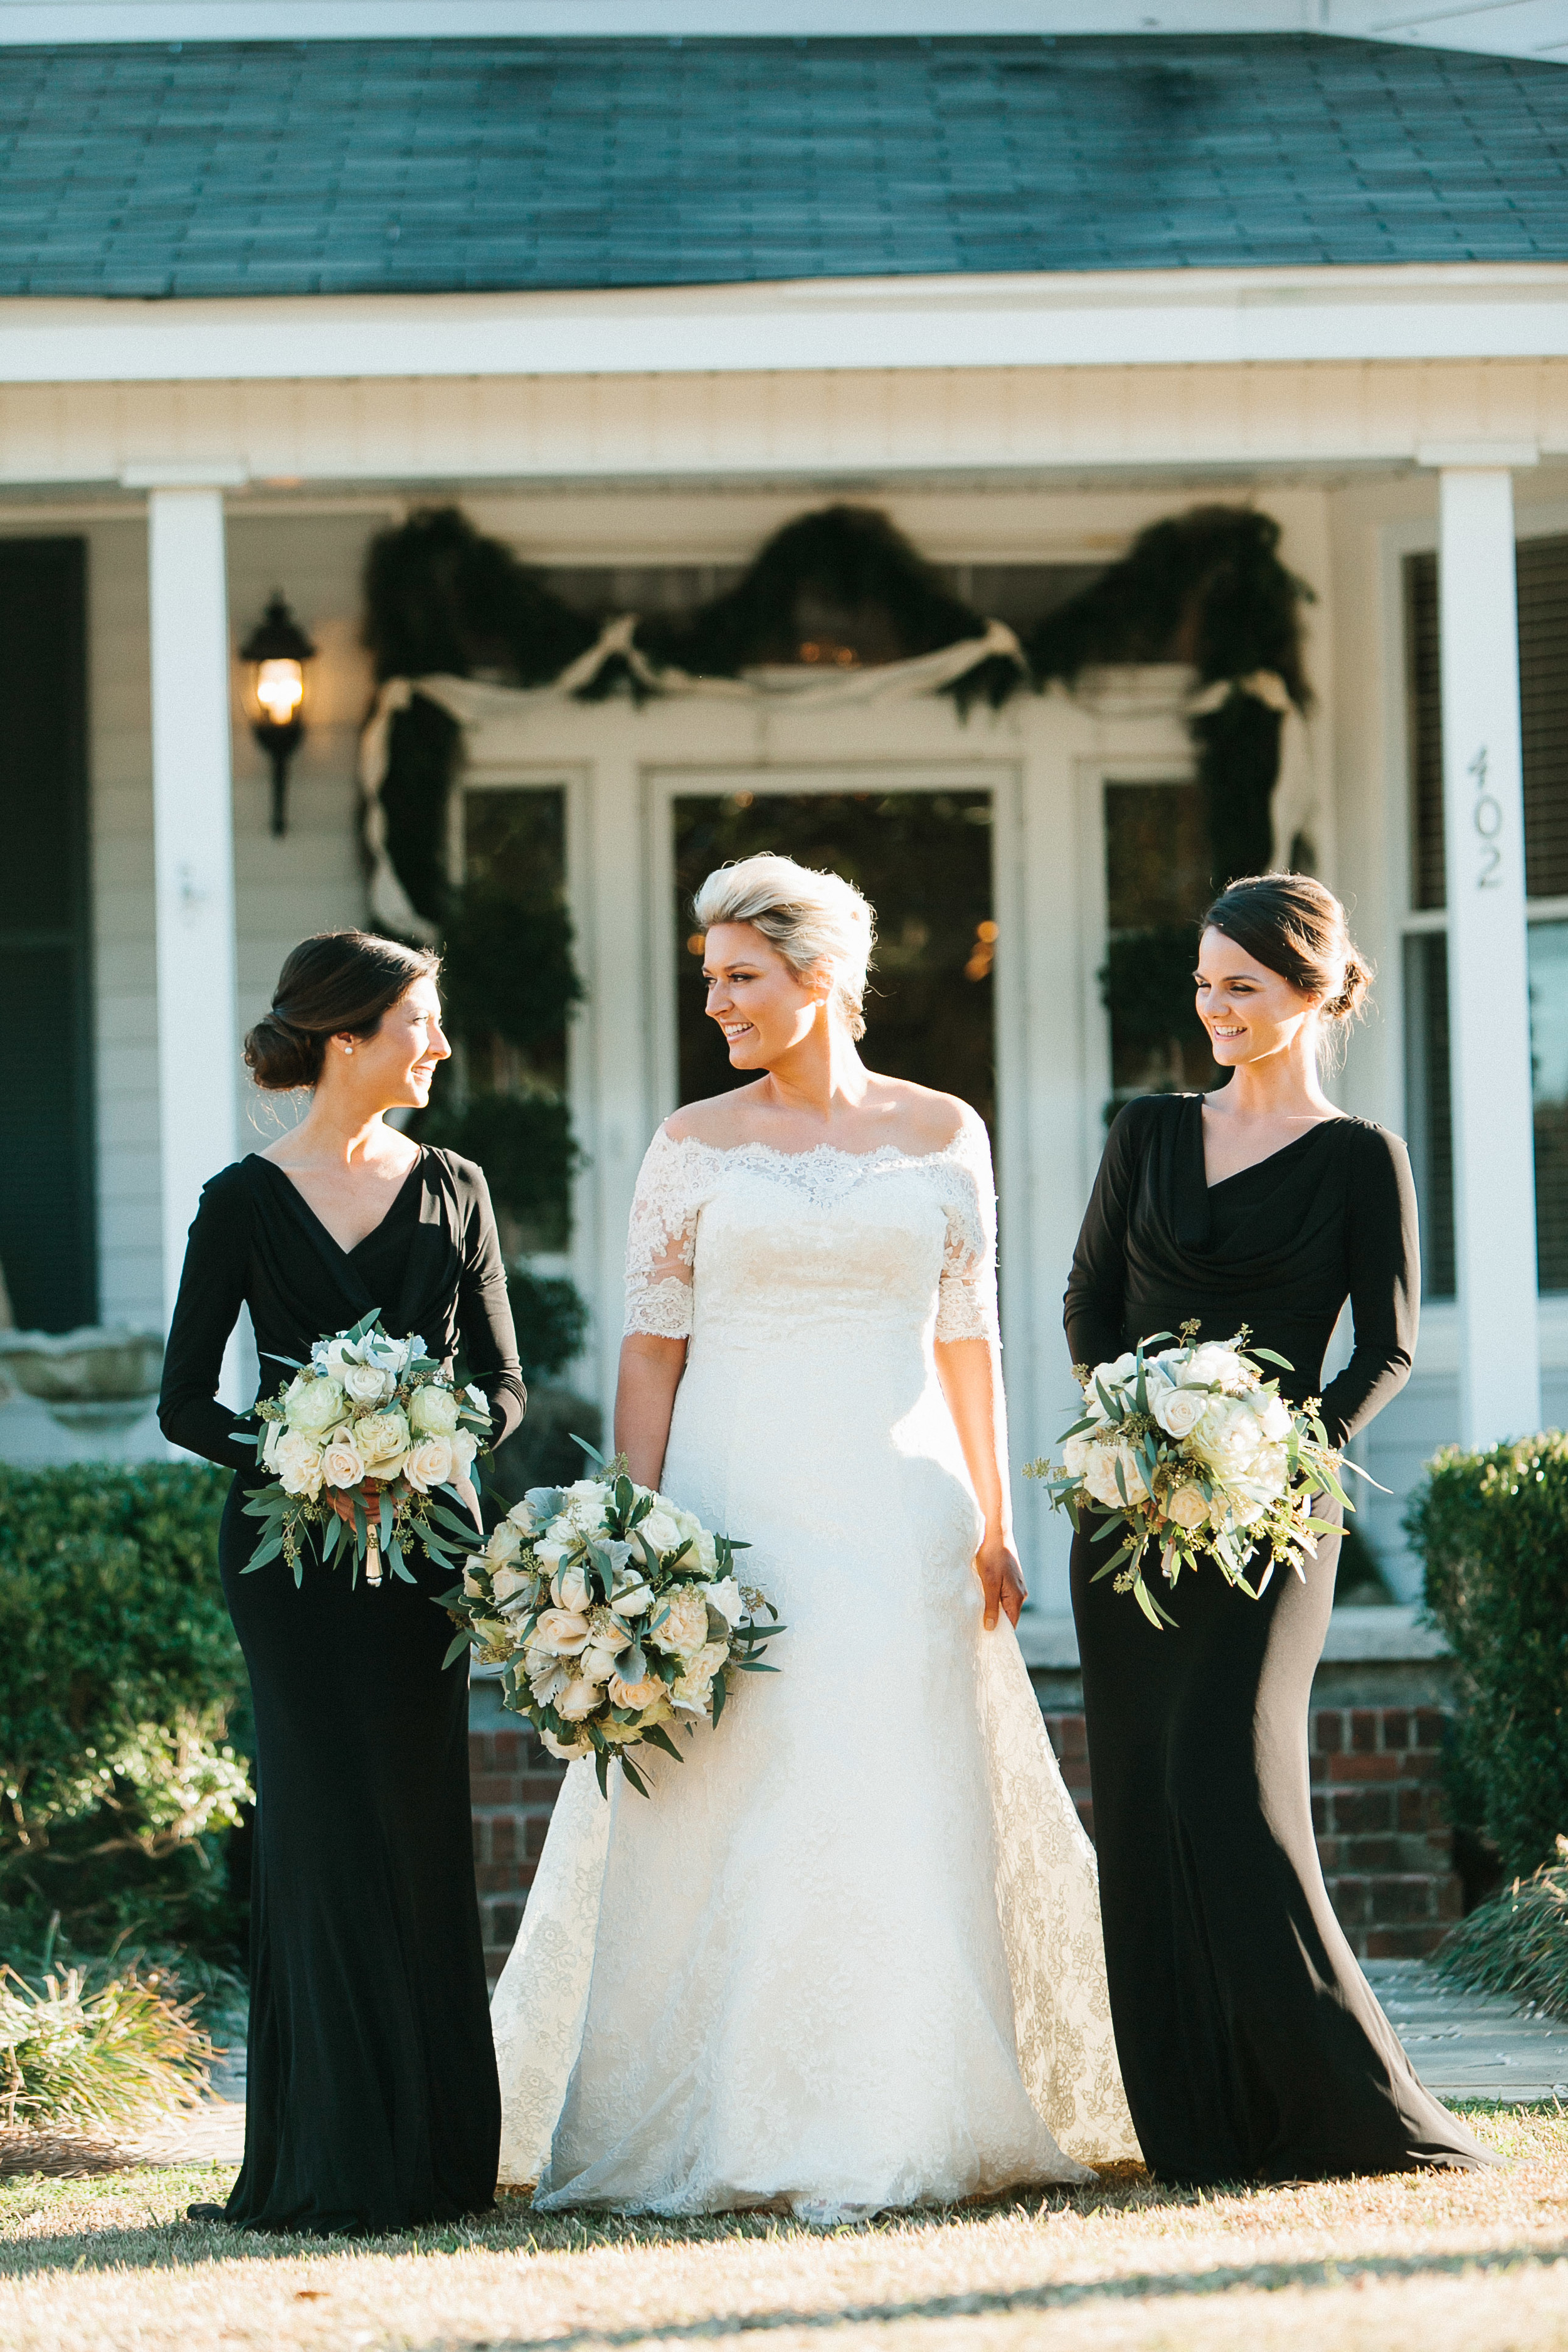 long sleeved black bridesmaids dresses for Winter Georgia wedding